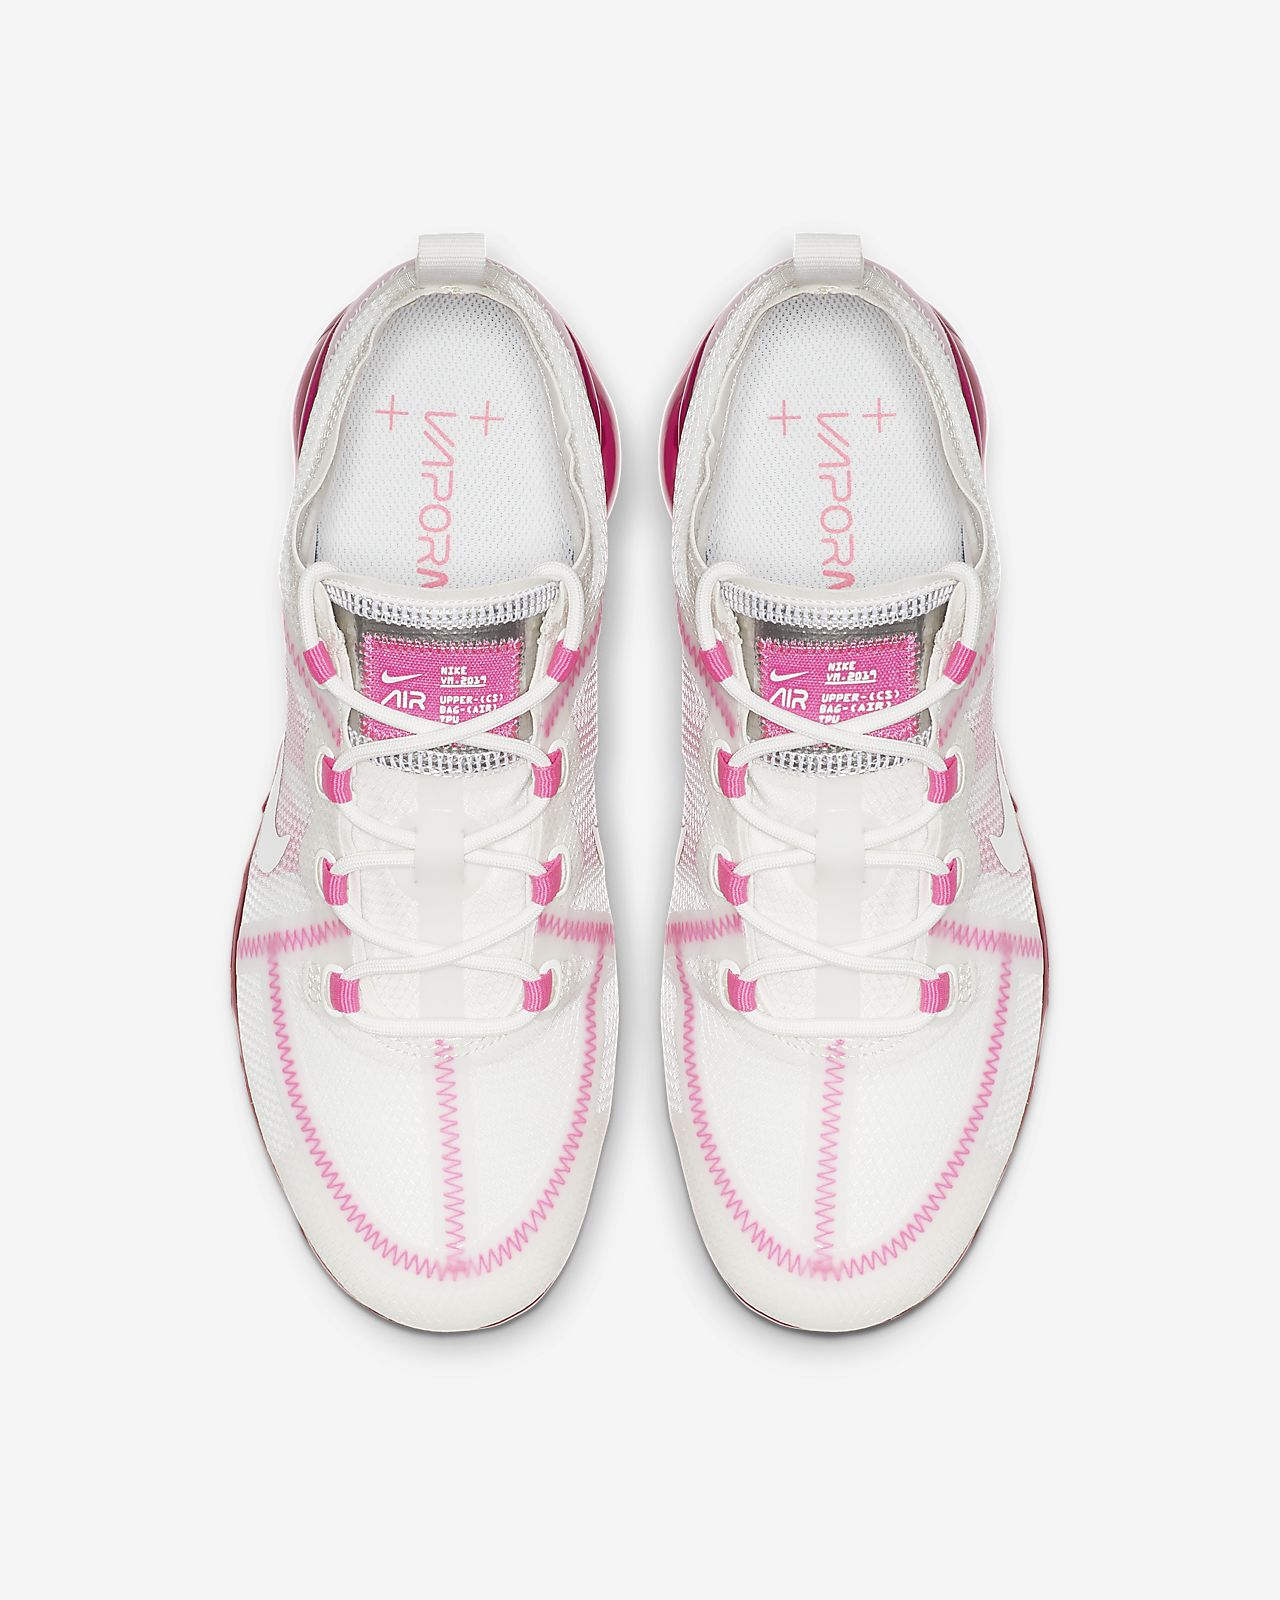 ab4a3b3e57 Nike Air VaporMax 2019 Women's Shoe. Nike.com AU